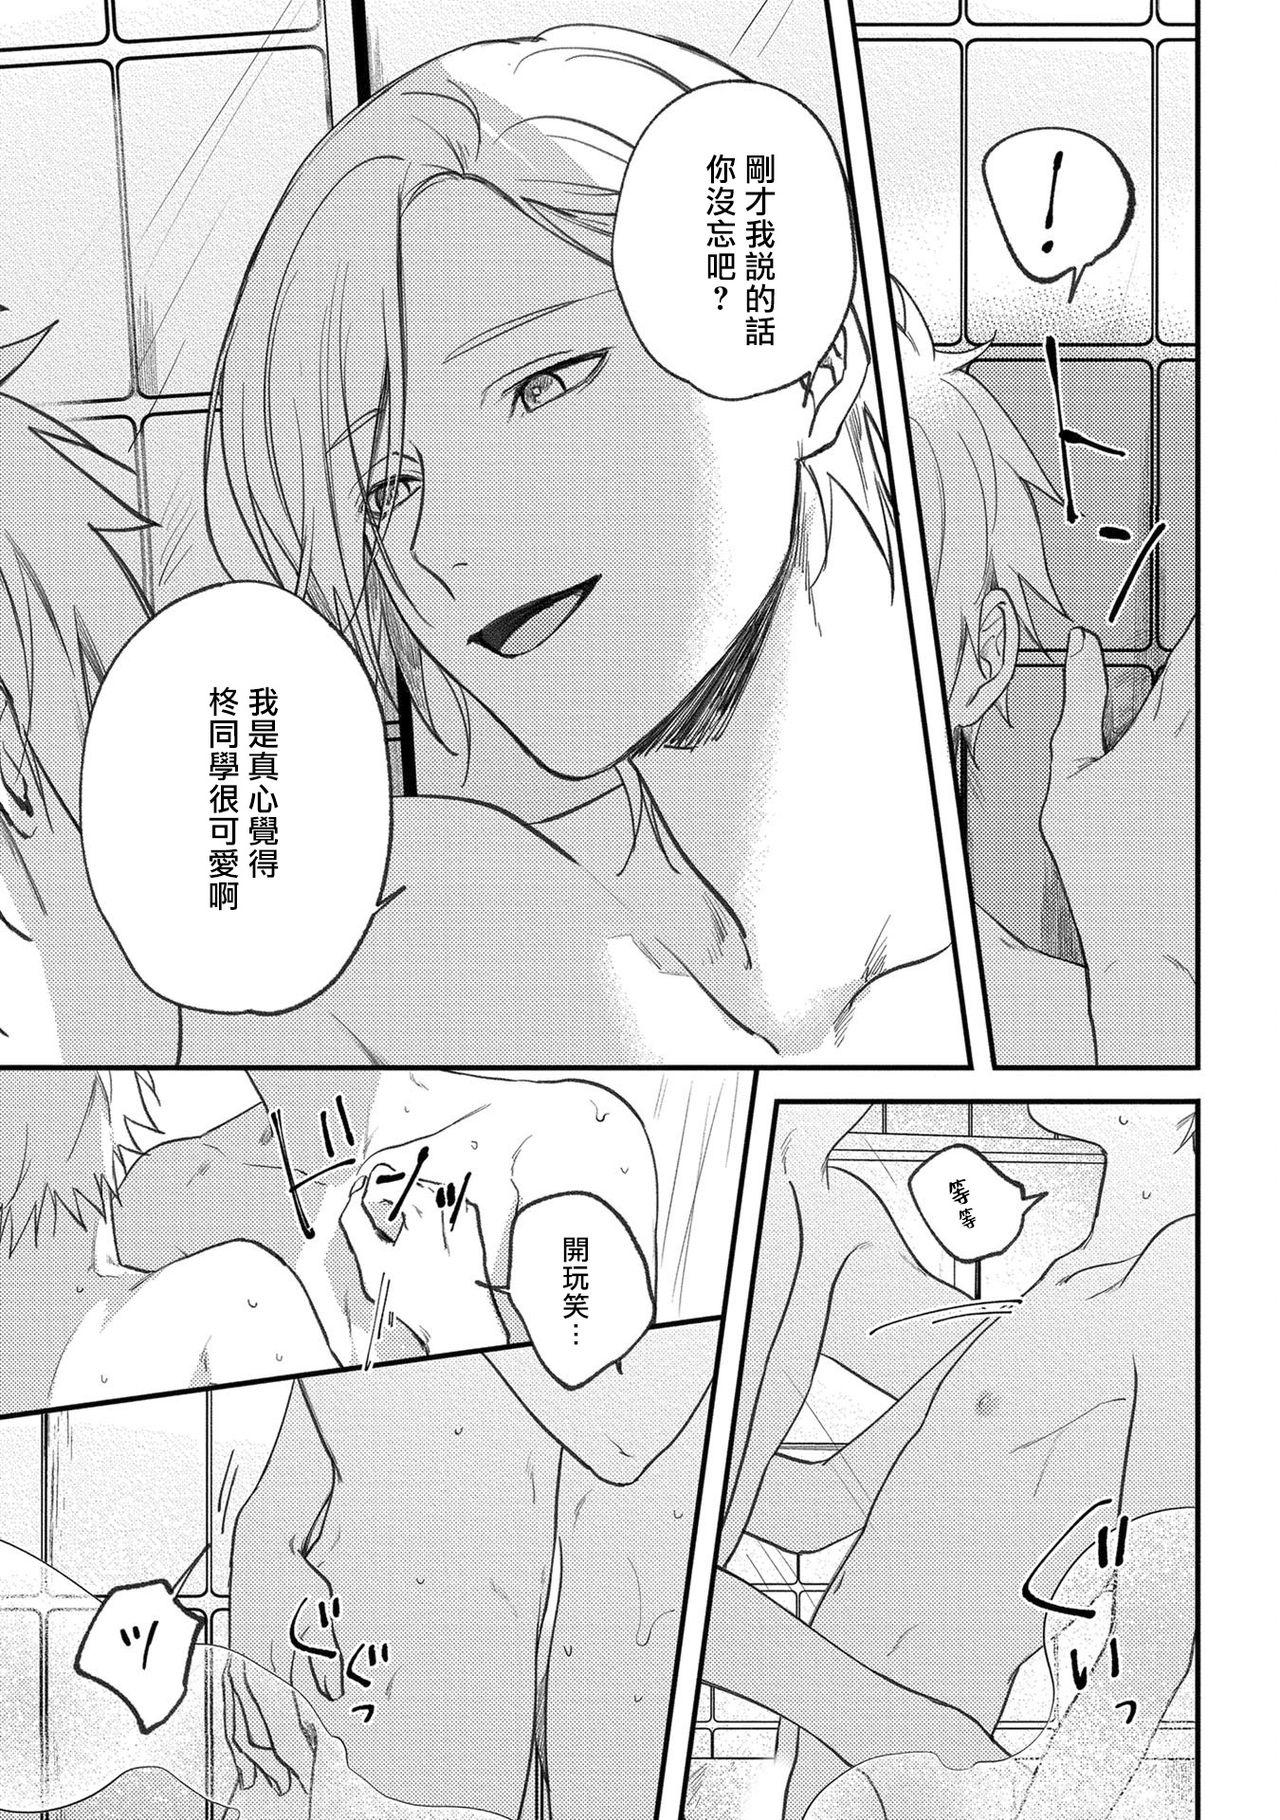 [Utata Hakuto] Houkago Virginity - Virginity afterschool 1-5 完结 [Chinese] [拾荒者汉化组] [Digital] 146